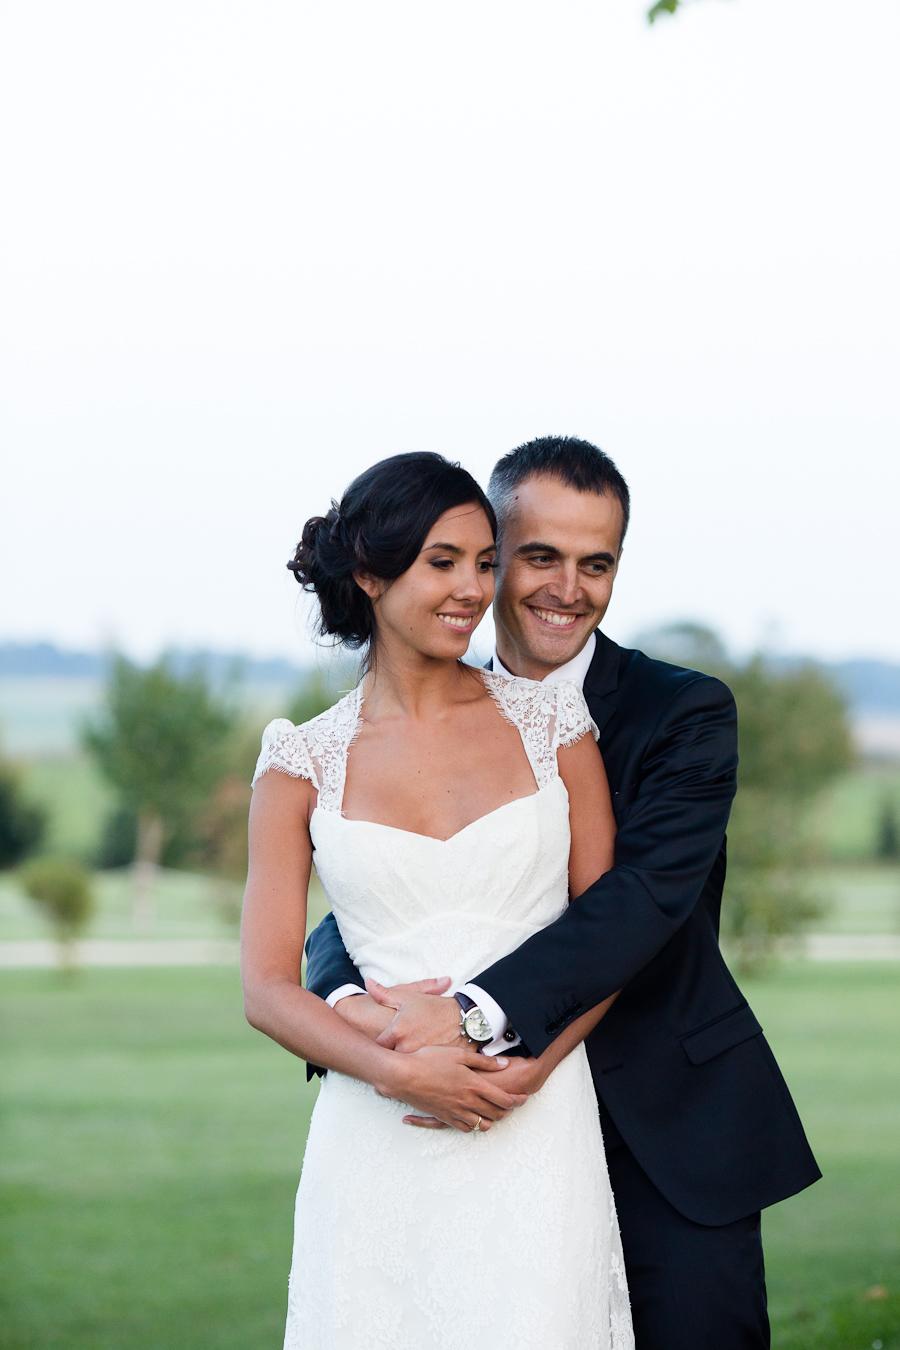 photographe-mariage-keith-flament-grange-de-montmartre-barbery-oise-108